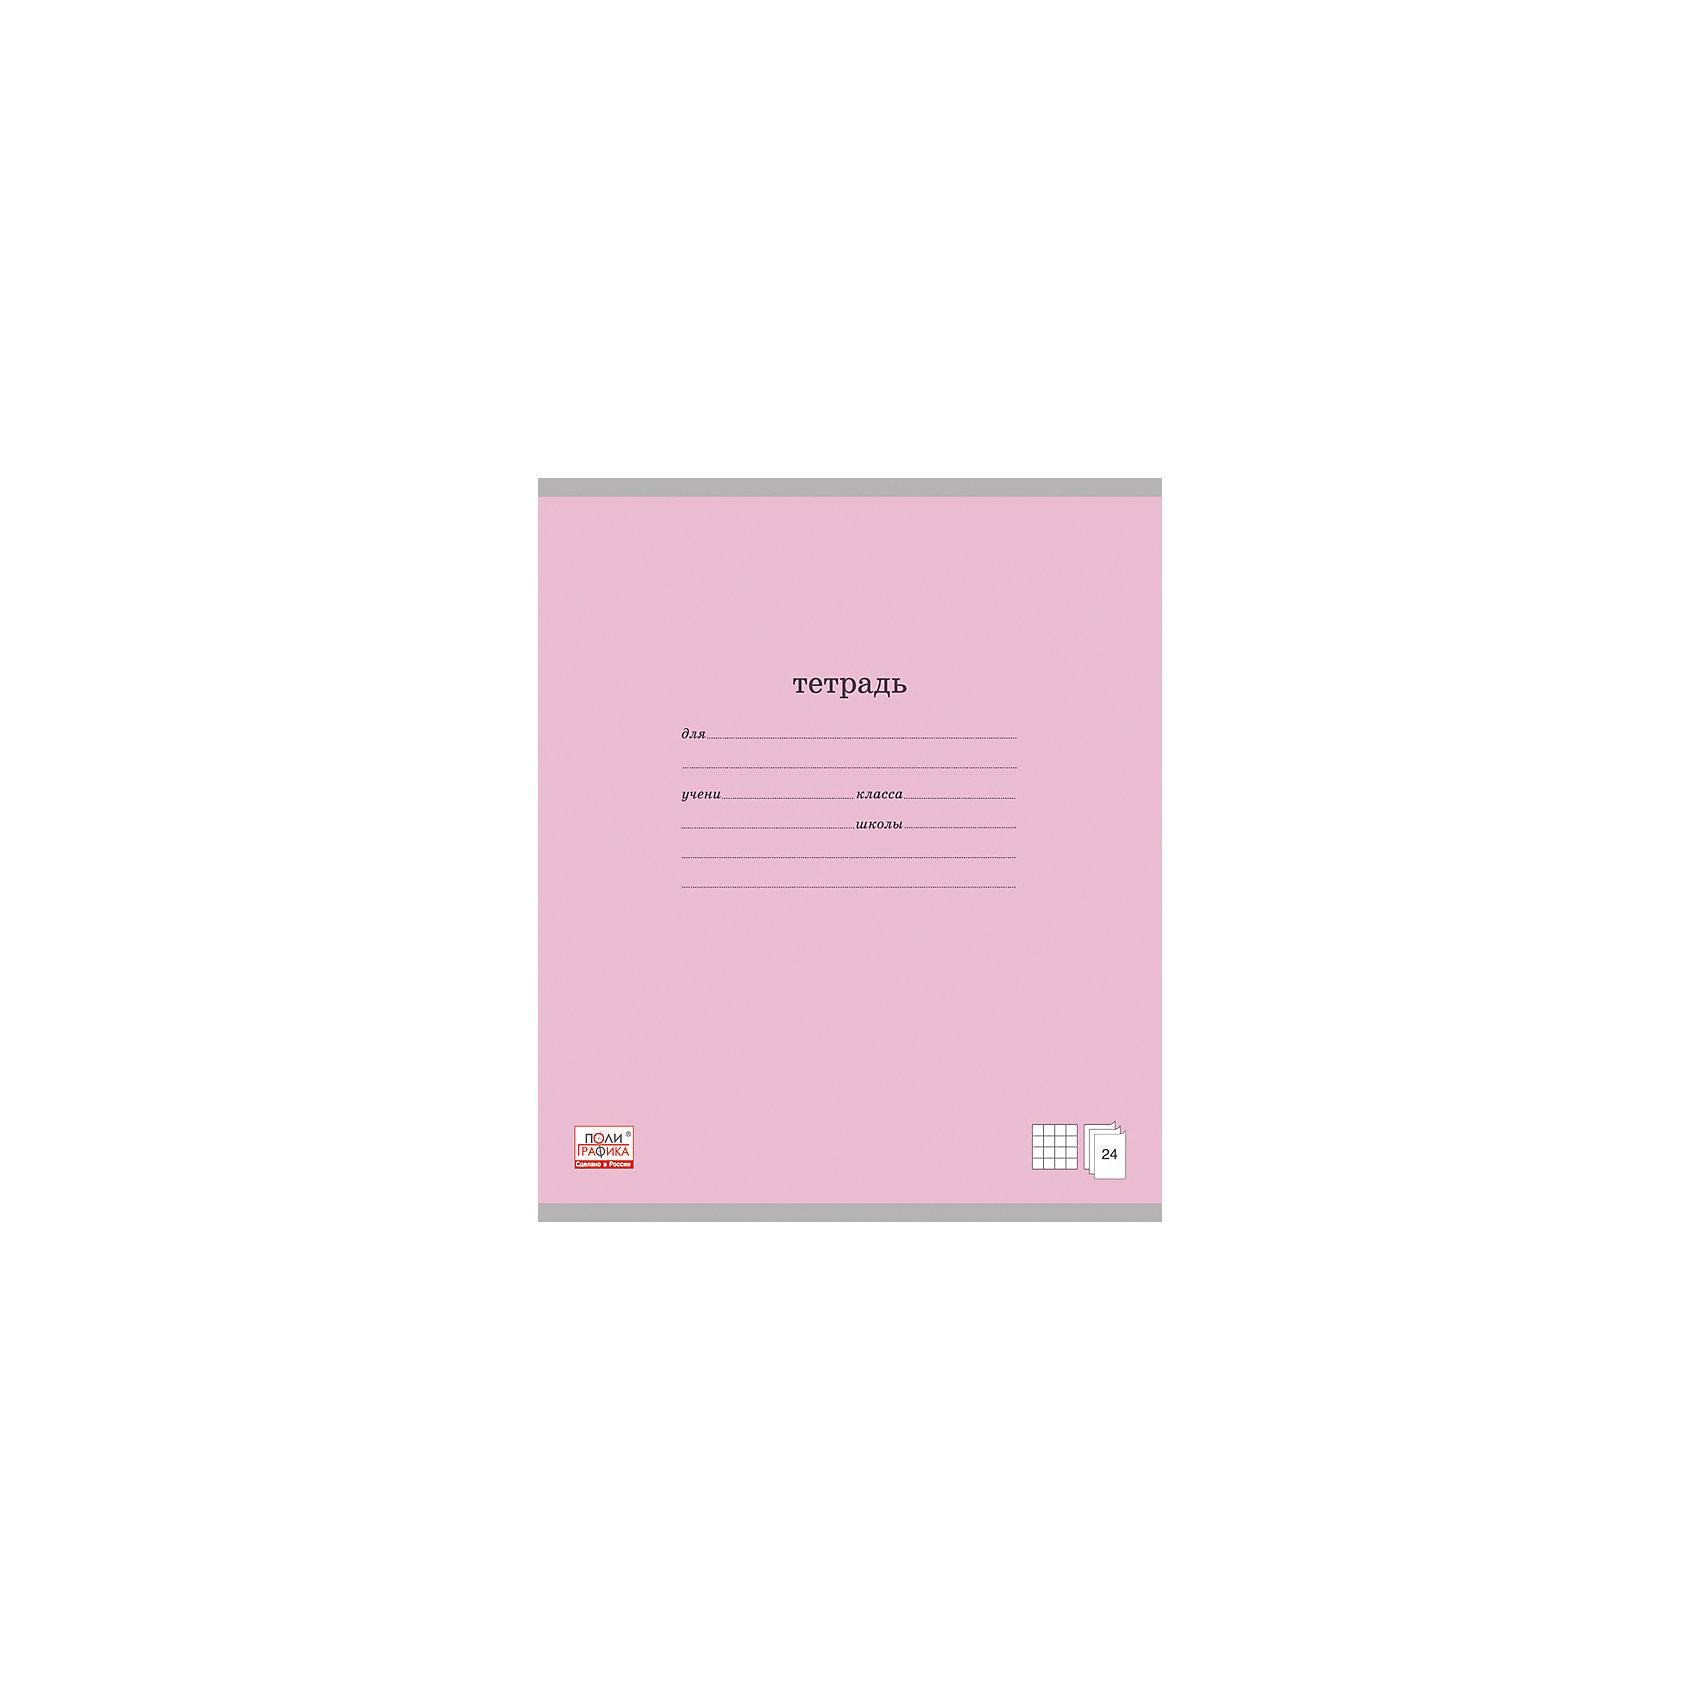 ErichKrause Тетрадь Классика, 24 л., 10 шт., розовая erichkrause тетрадь стиляги 24 л 10 шт